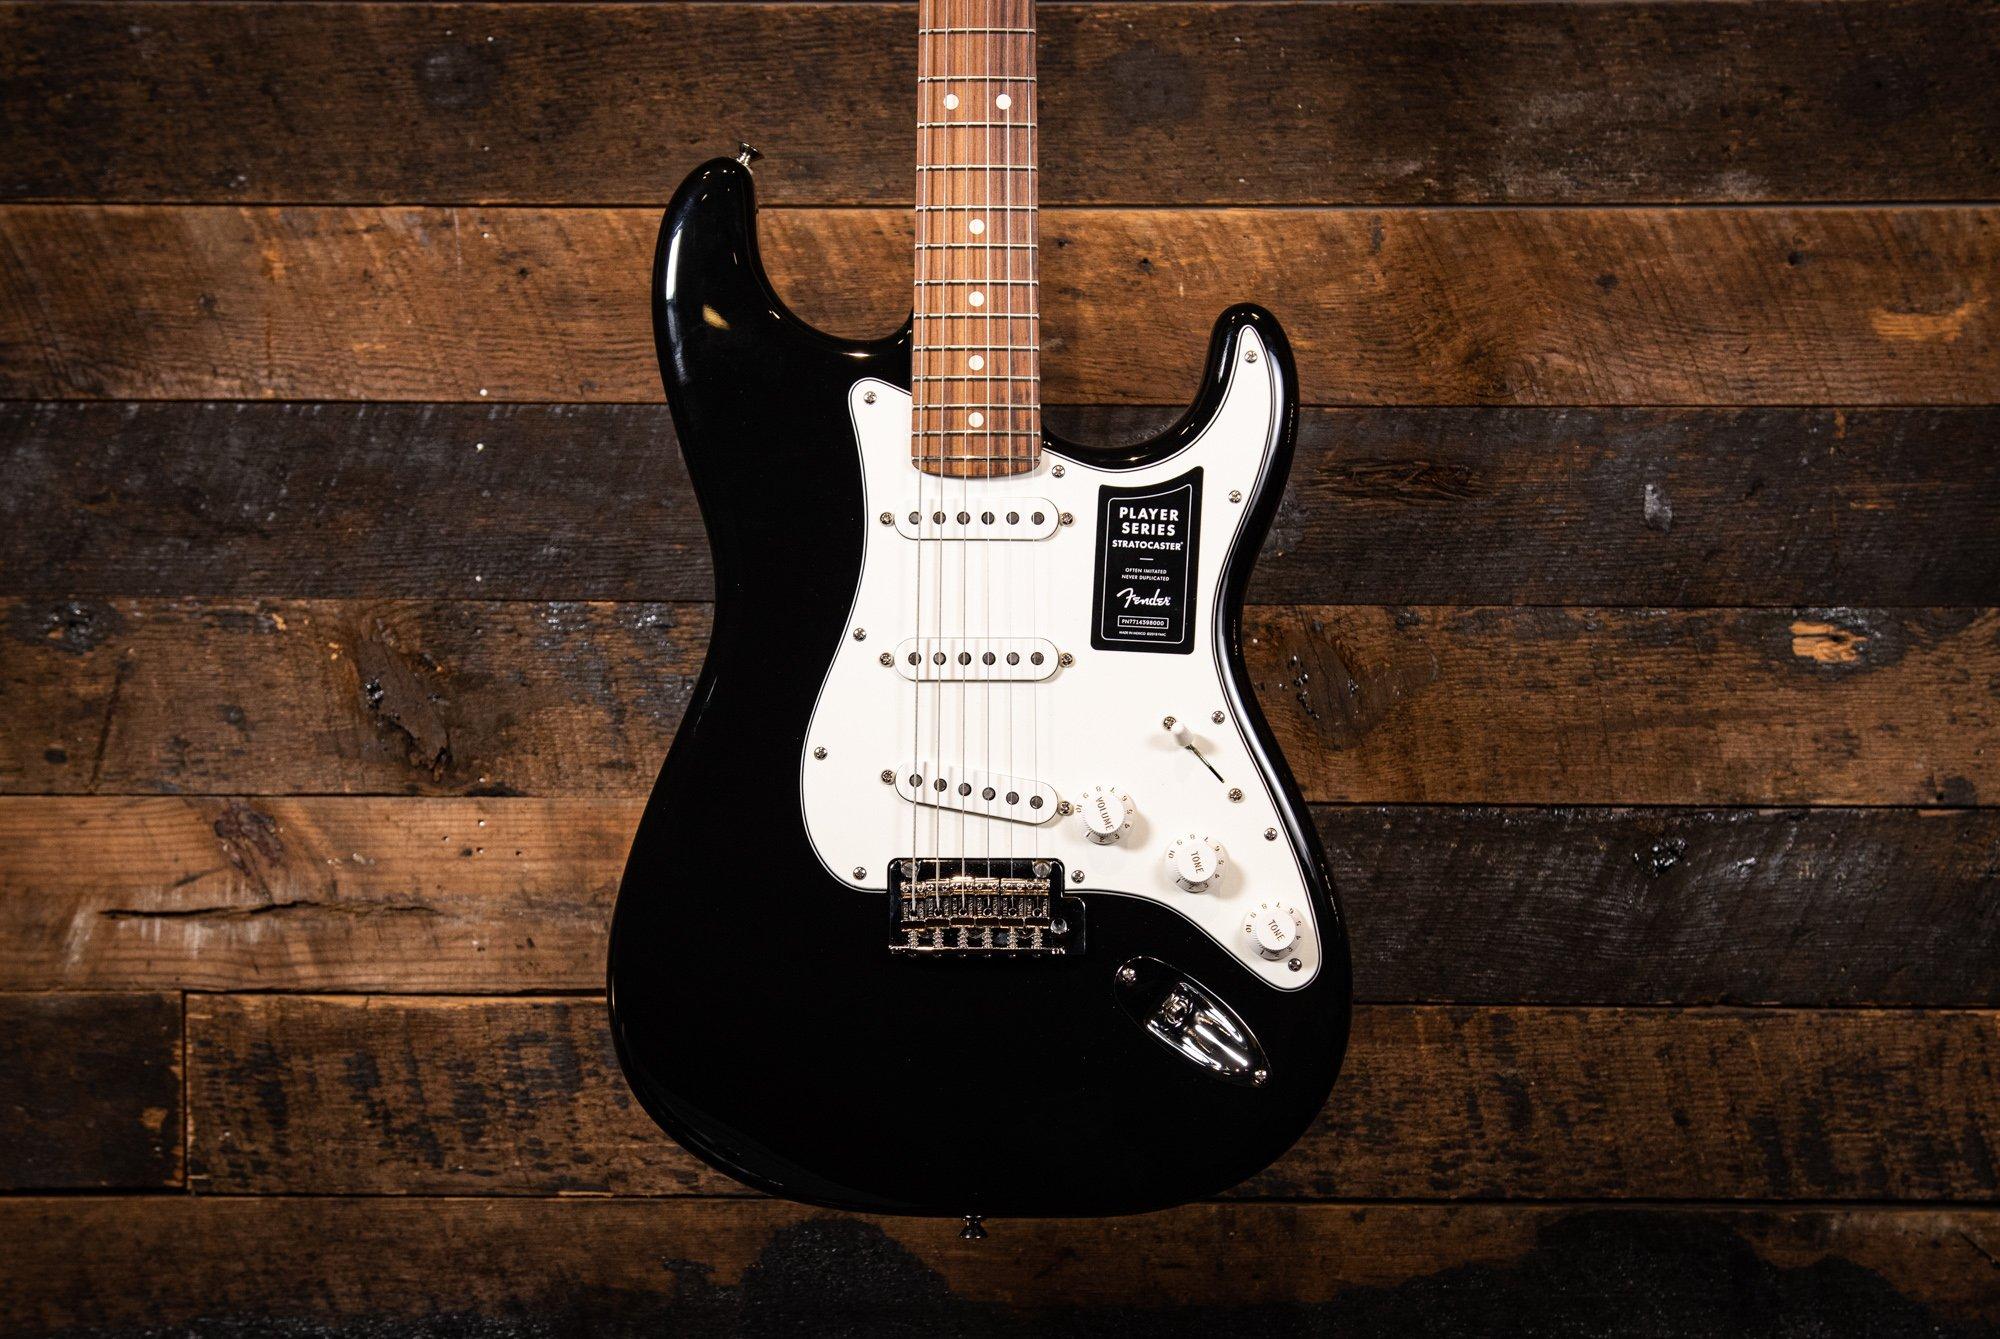 Fender Player Series Stratocaster Black